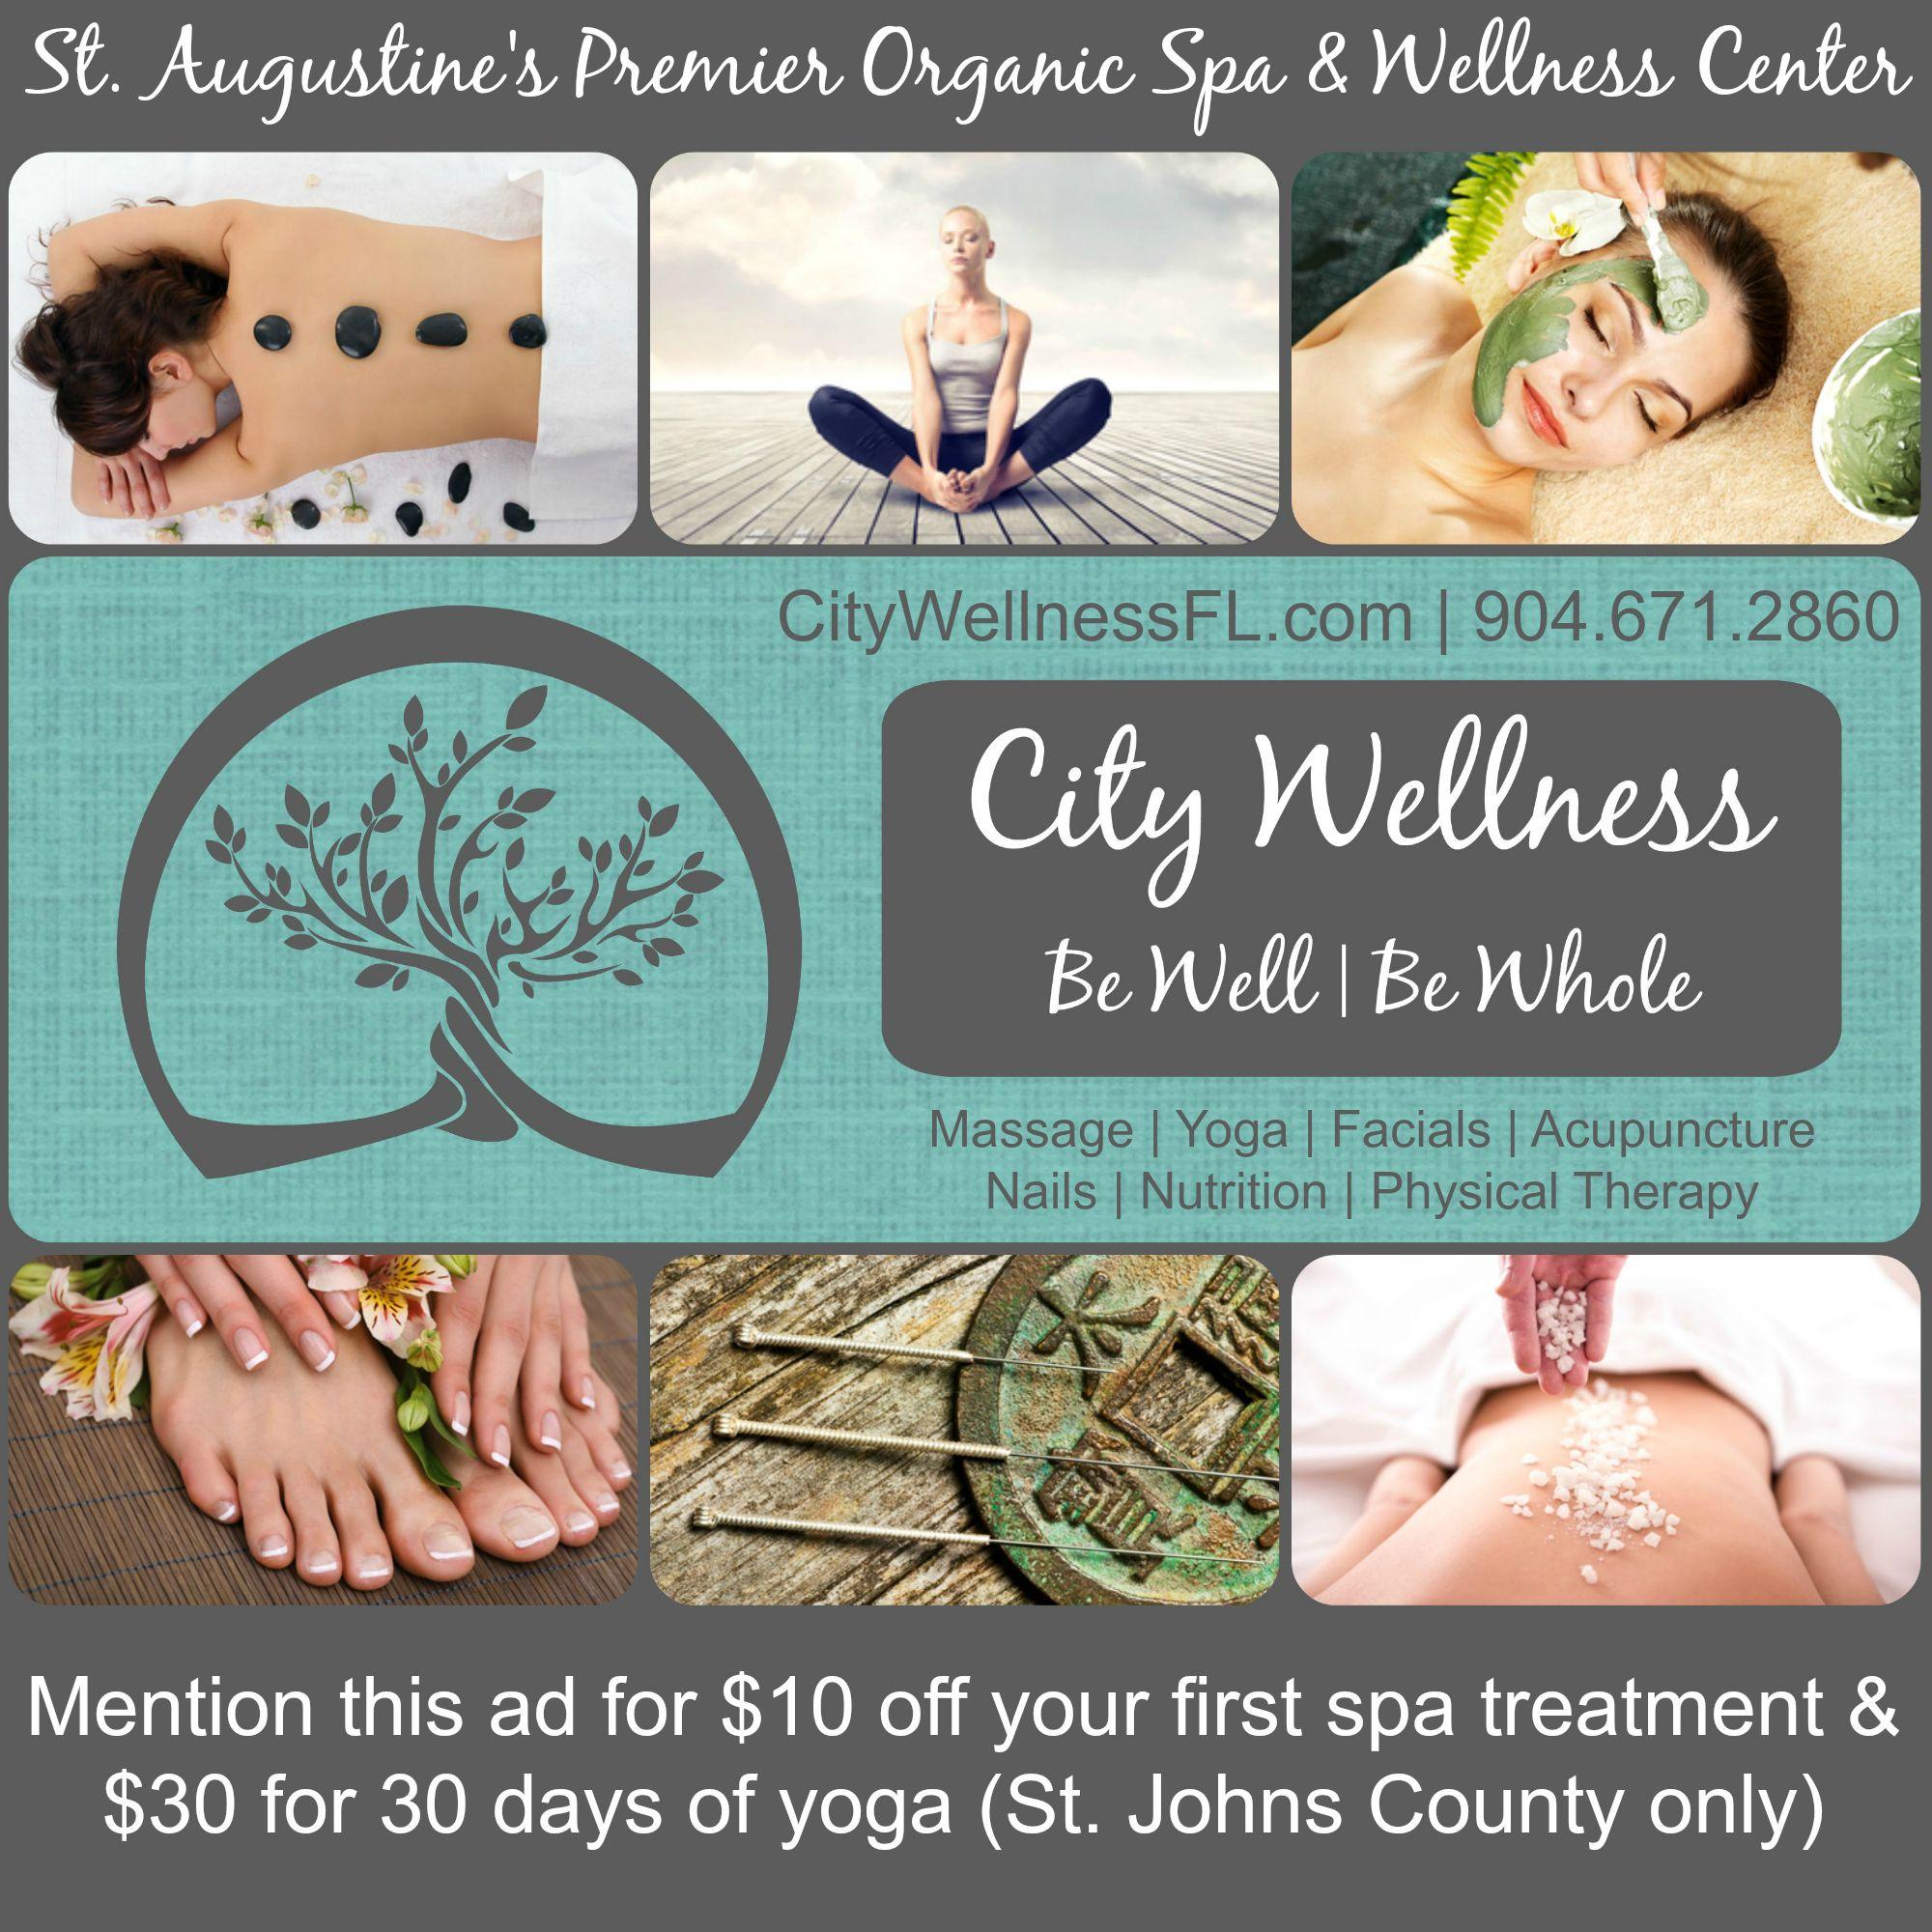 City wellness st augustine wellness spa spa treatments